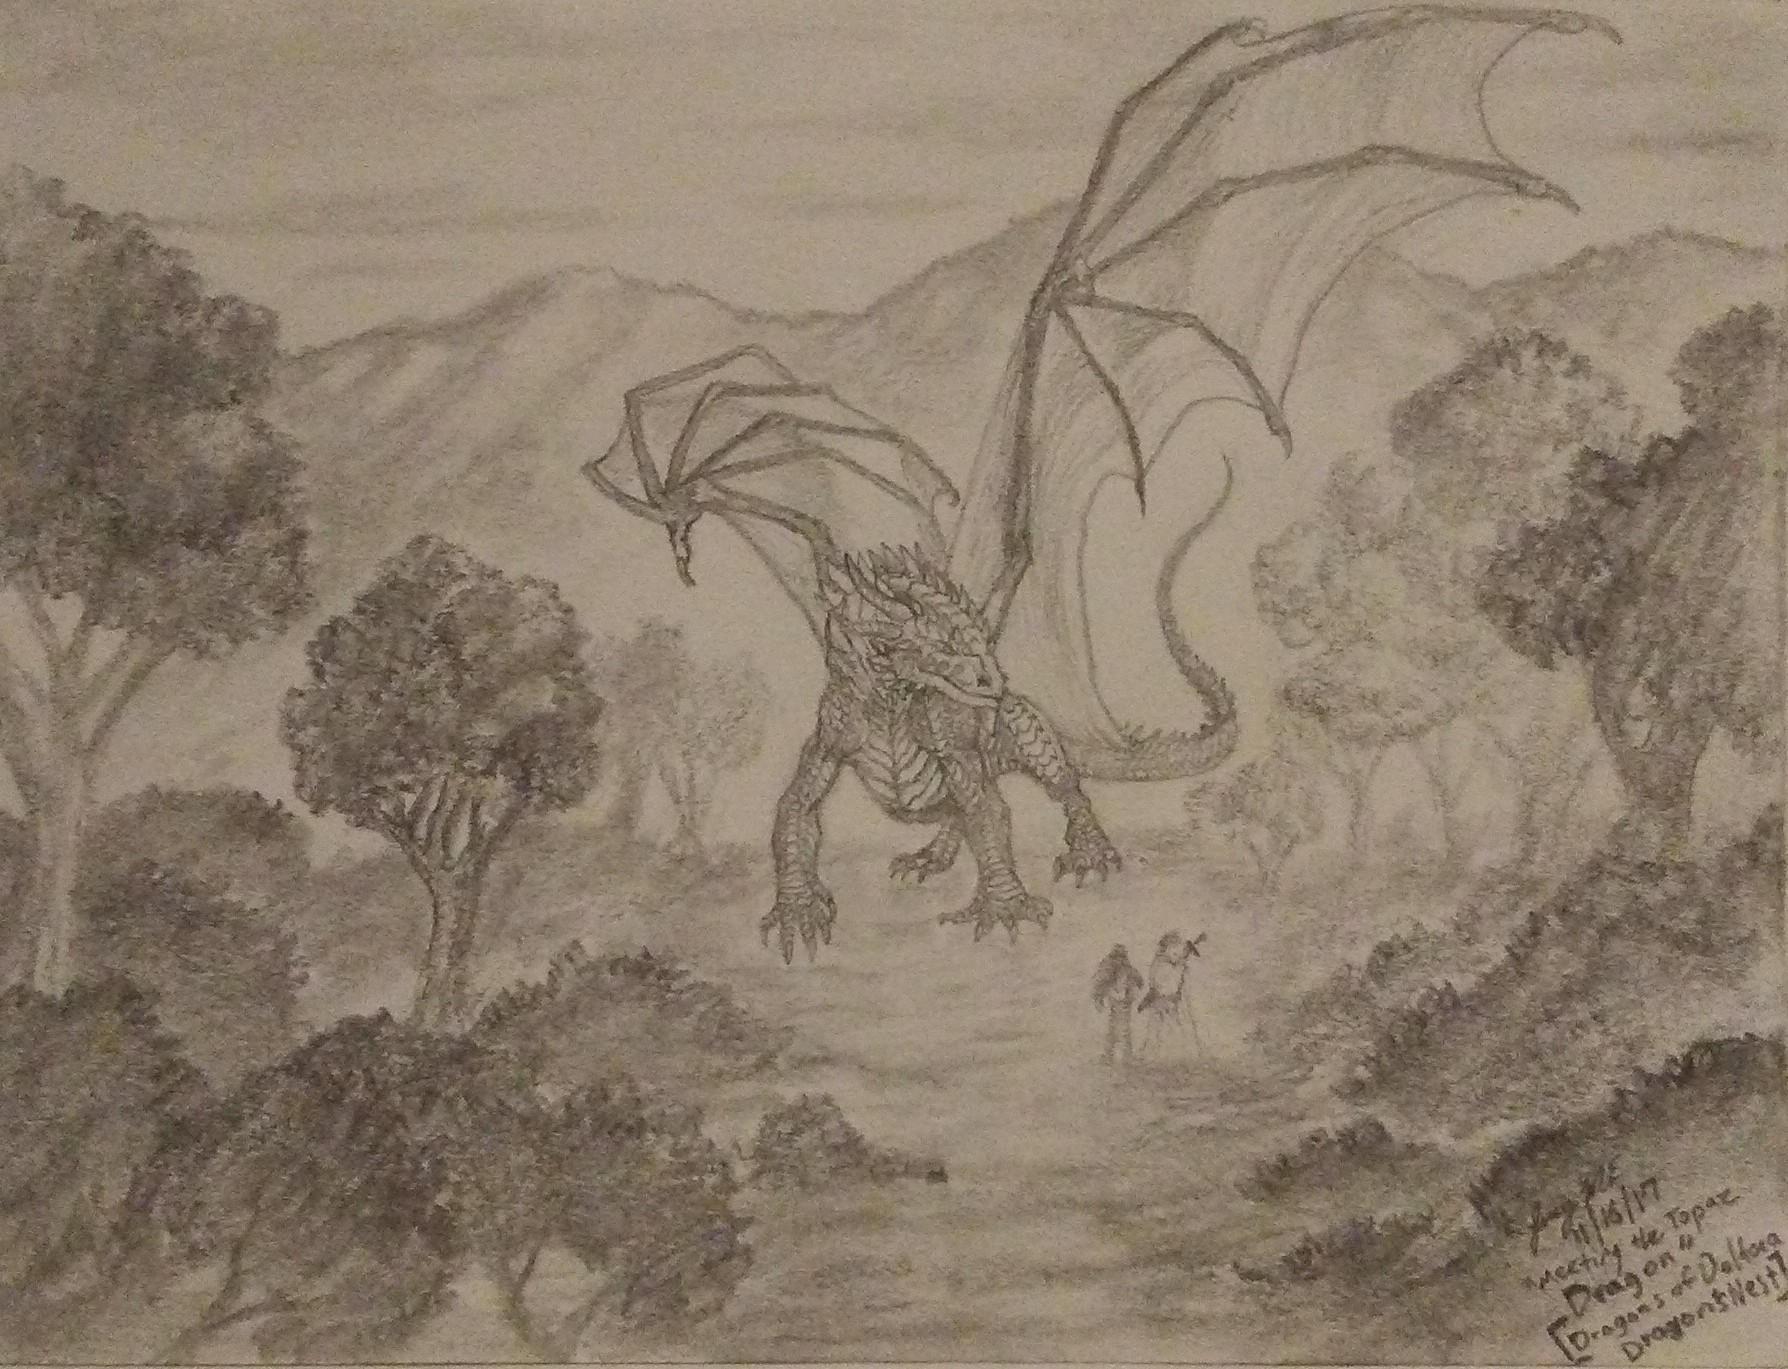 Meeting The Topaz Dragon by Enigmatic-Ki